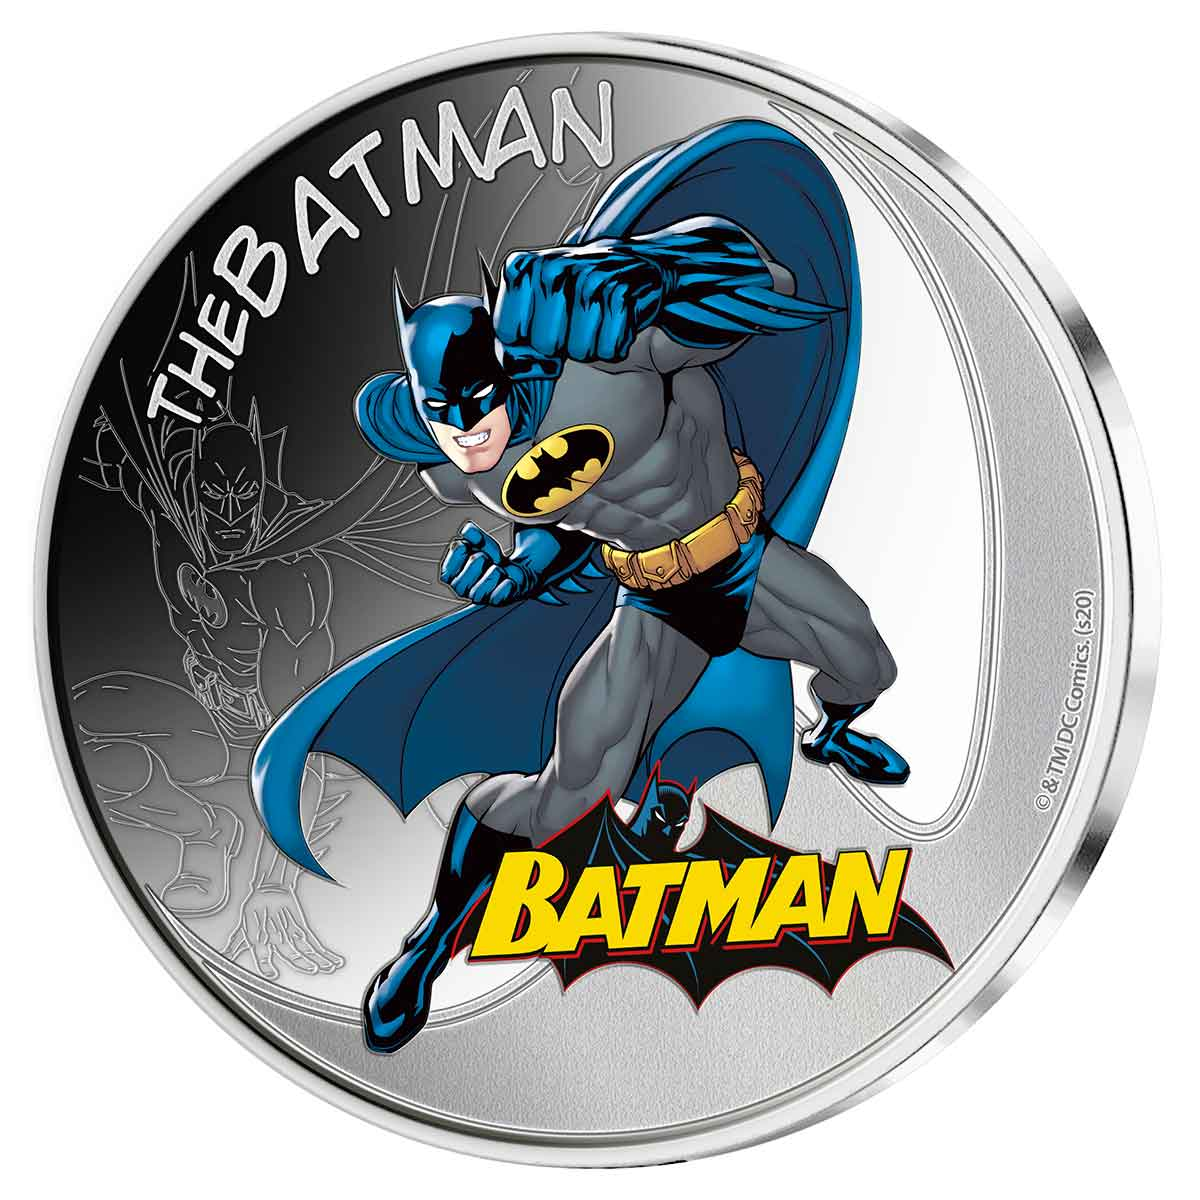 The Batman Punch